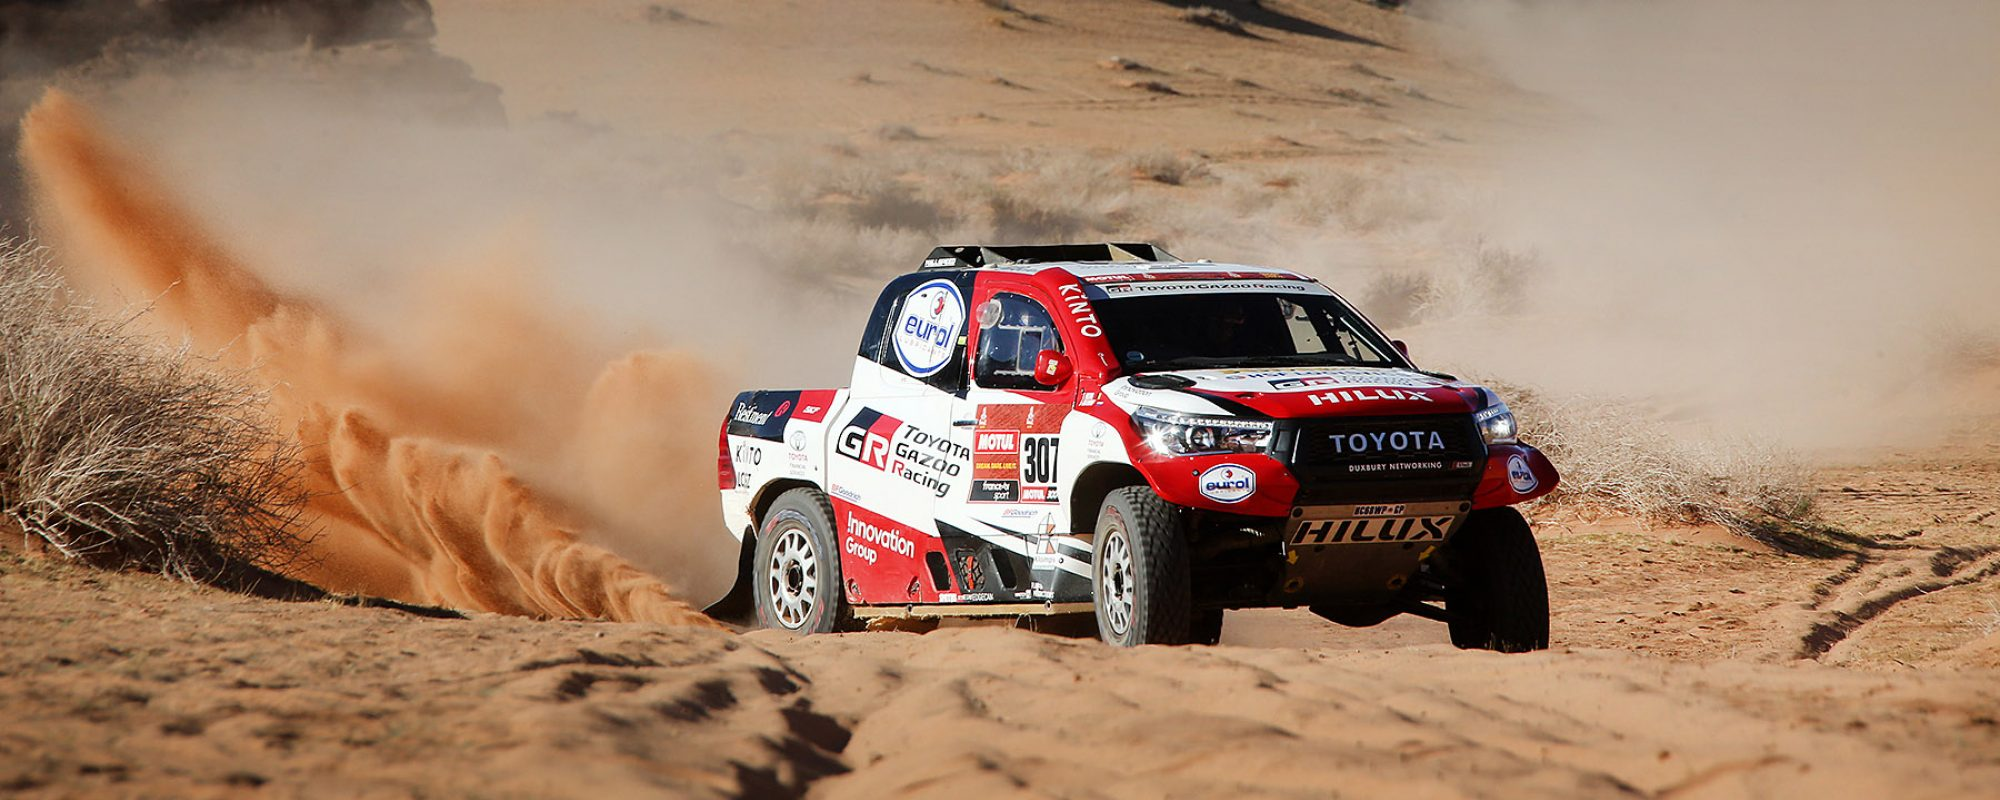 Bernhard ten Brinke consolideert in vijfde Dakar etappe